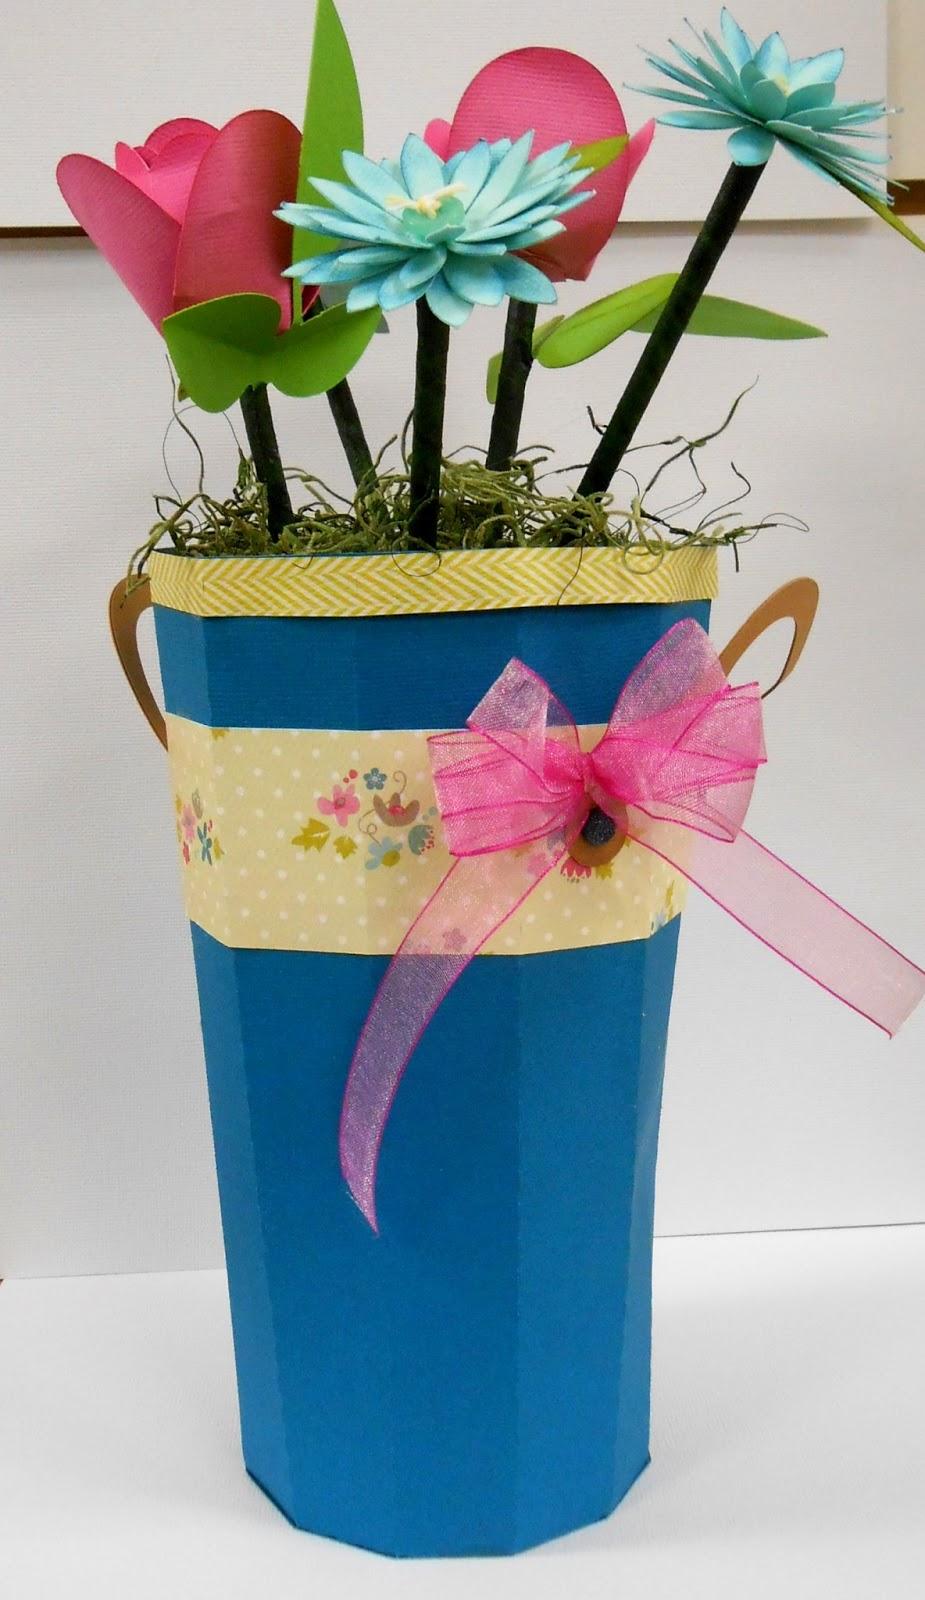 Birthday Bucket Of Flowersby Melissa Cash 11